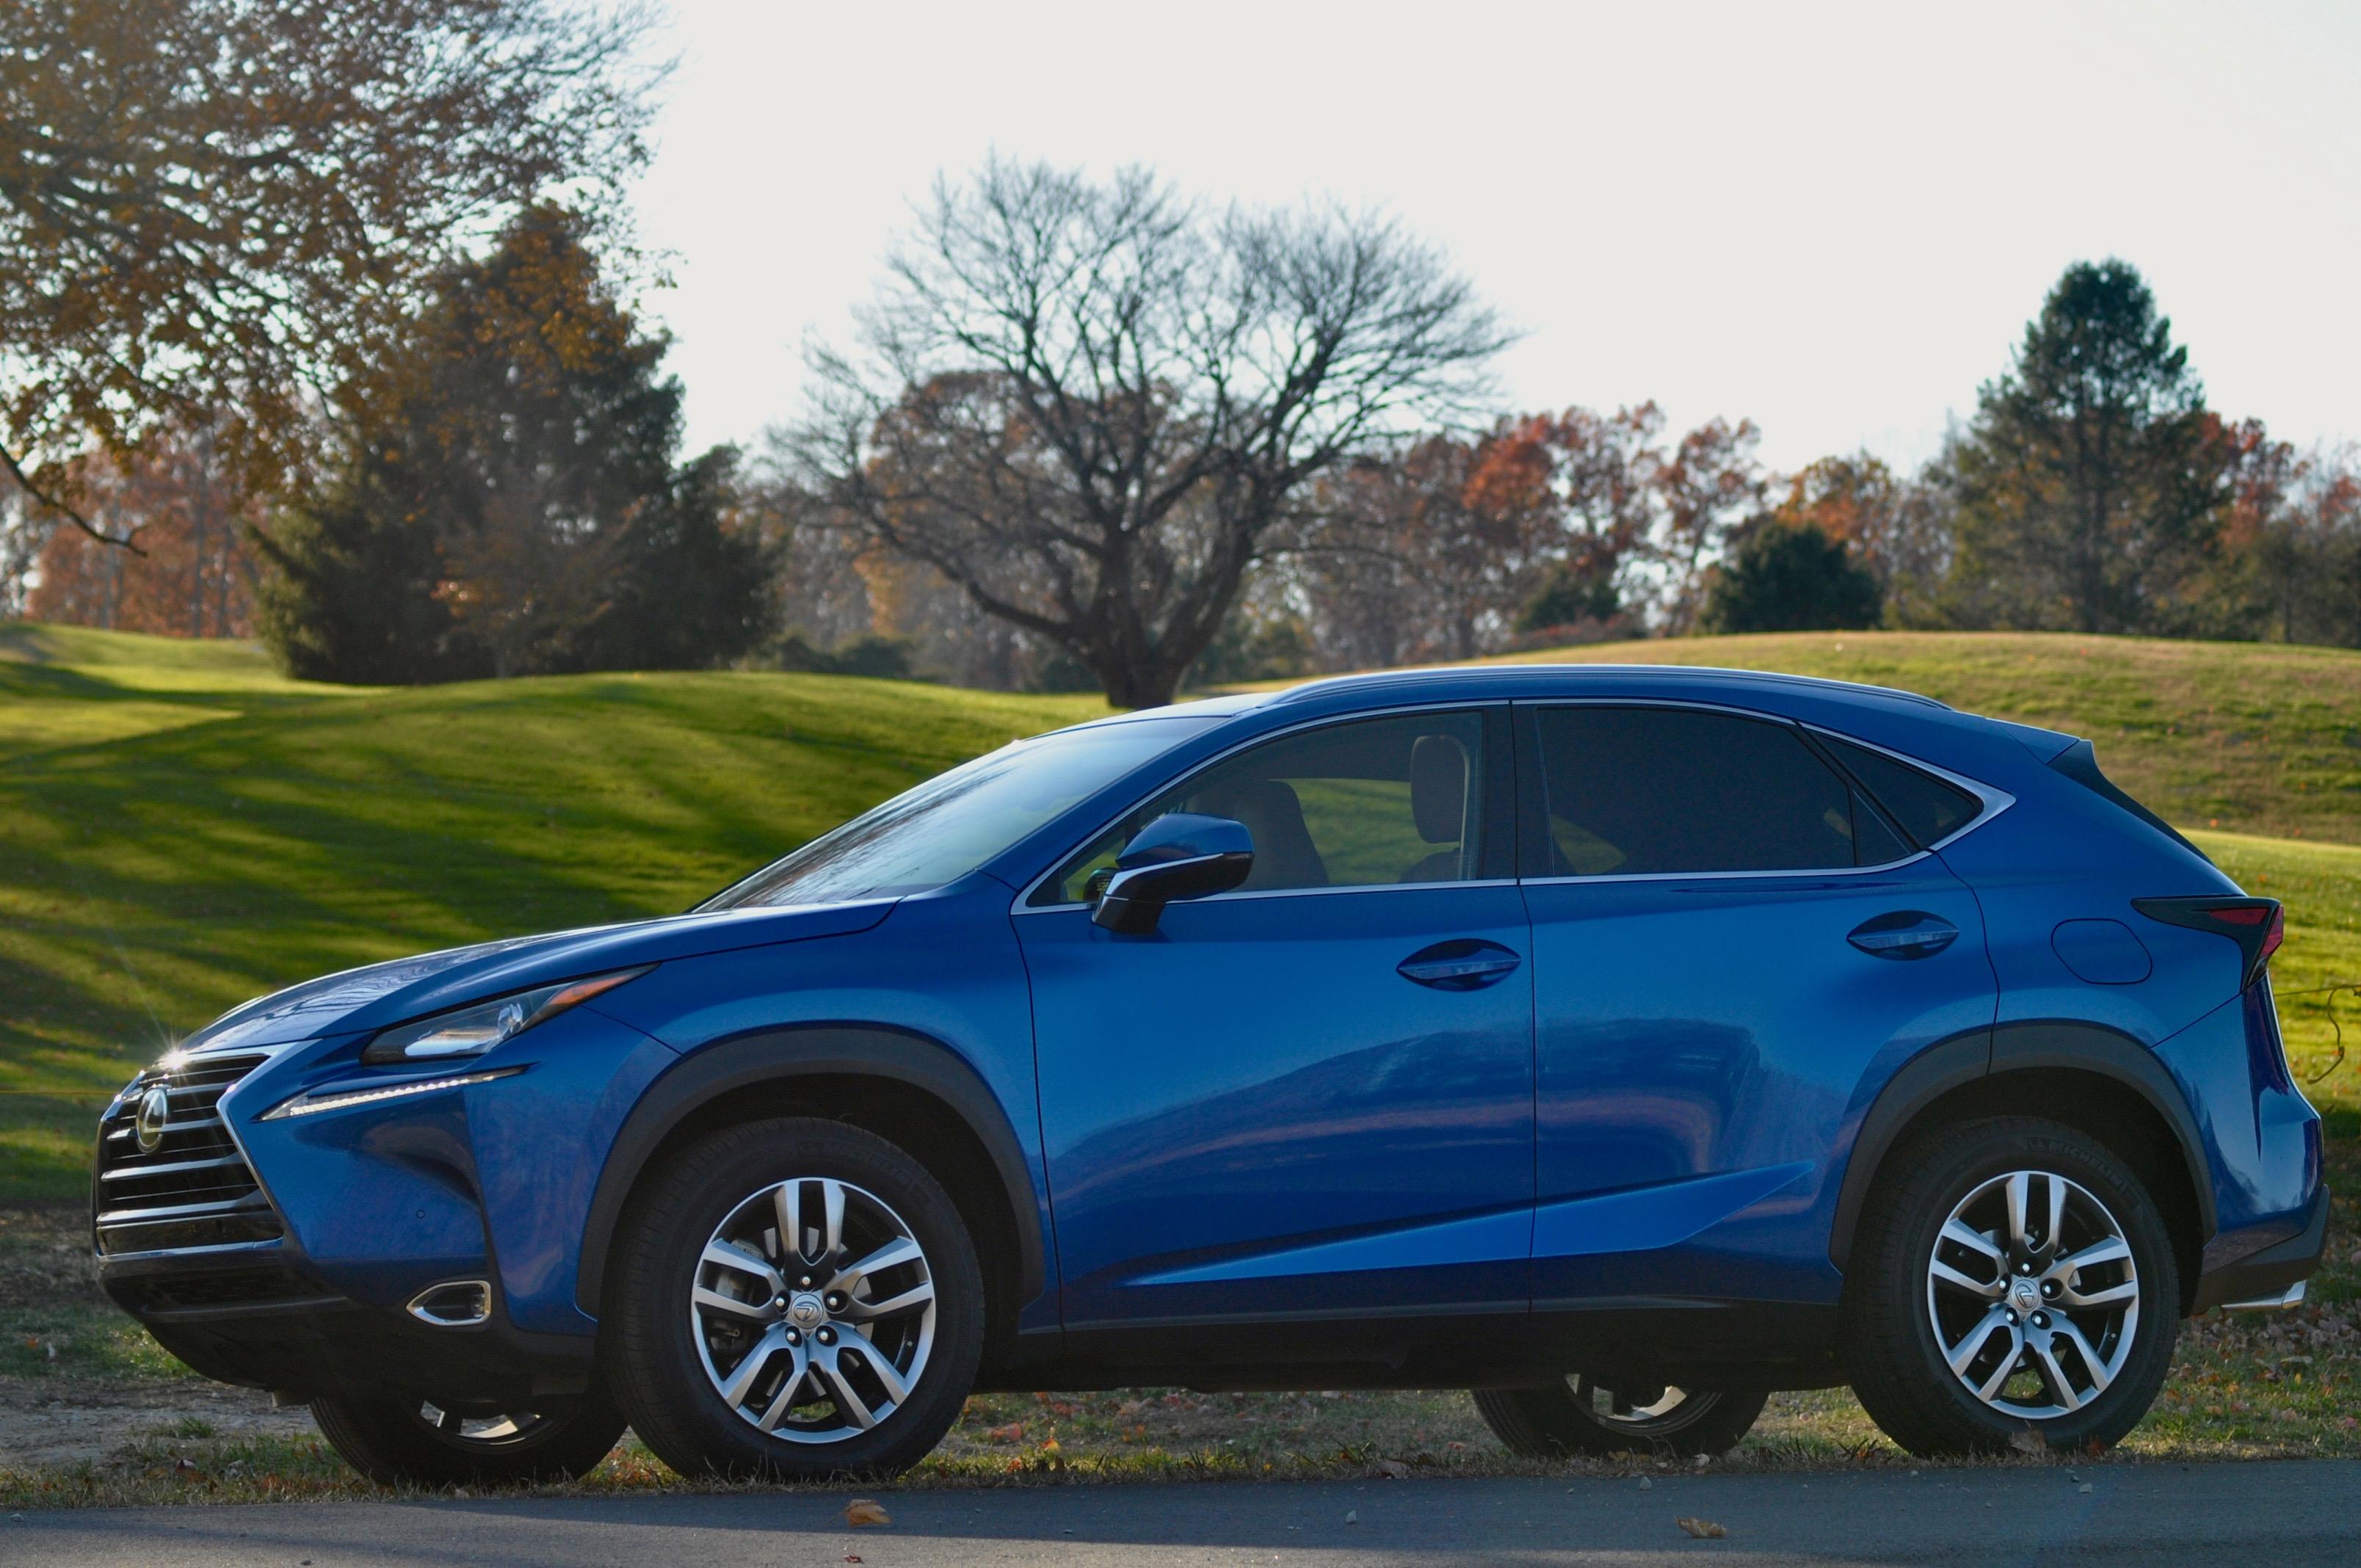 report tests review premier lexus auto road price nx test